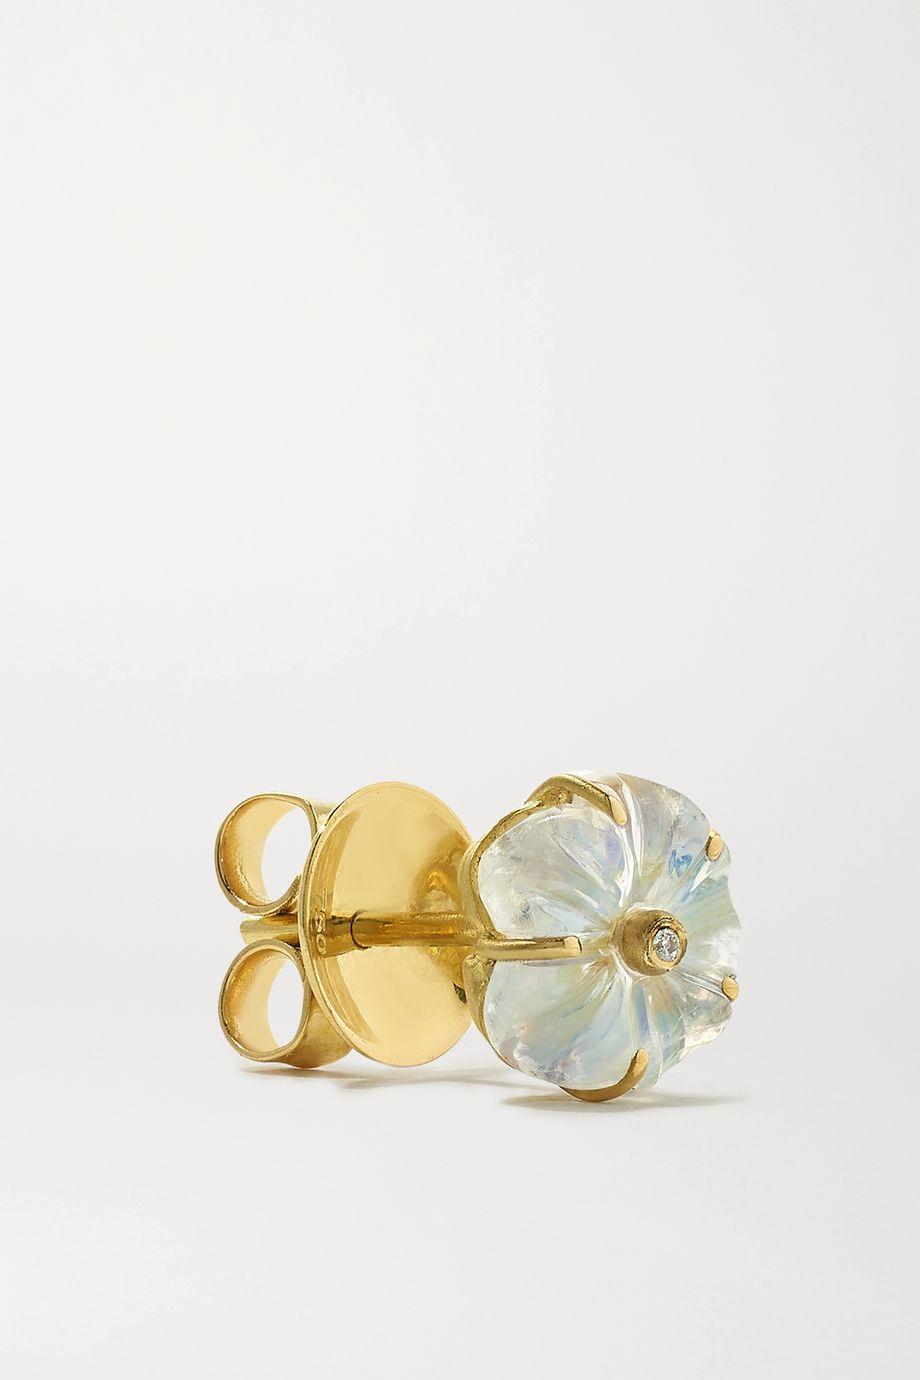 Brooke Gregson Blossom 18-karat gold, moonstone and diamond earrings